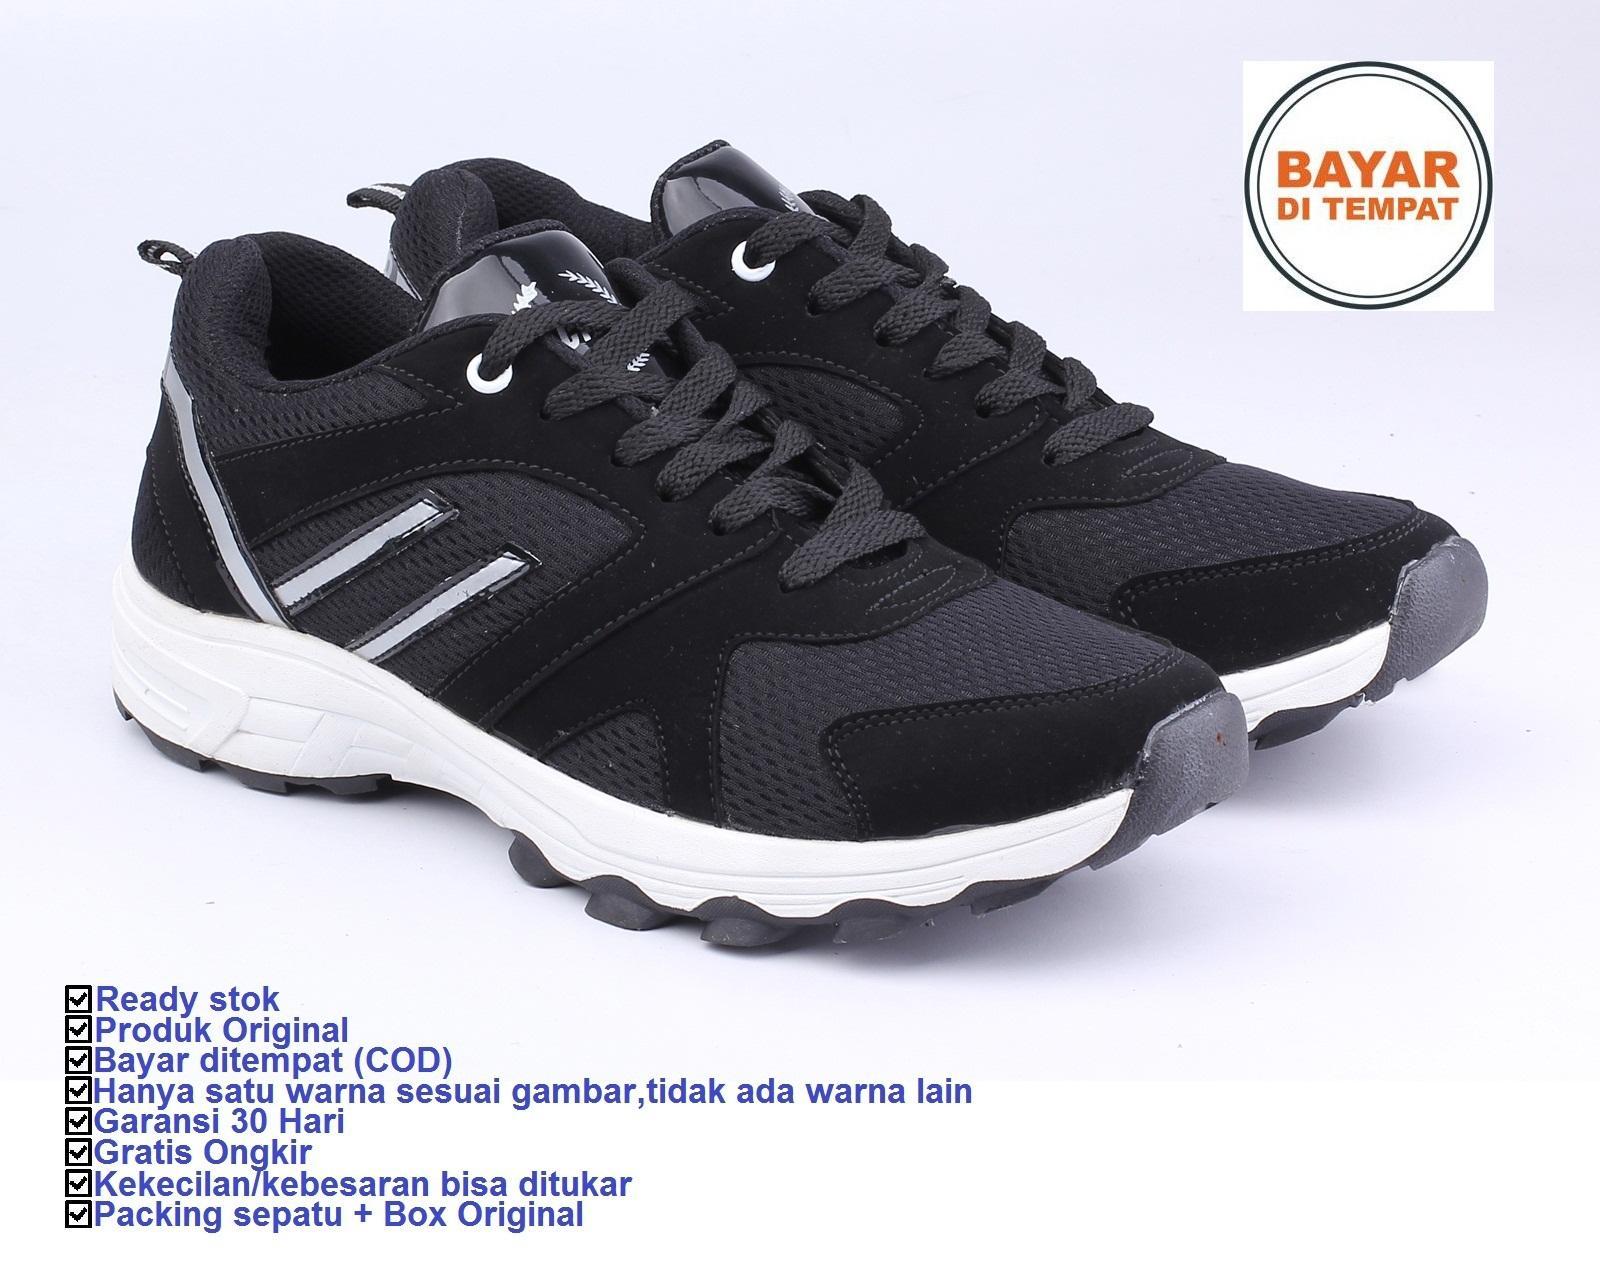 Catenzo Sepatu Olahraga Lari Running Fitnes Aerobik Senam Sekolah Kuliah Kerja AT103 Trendy Best Seller Running